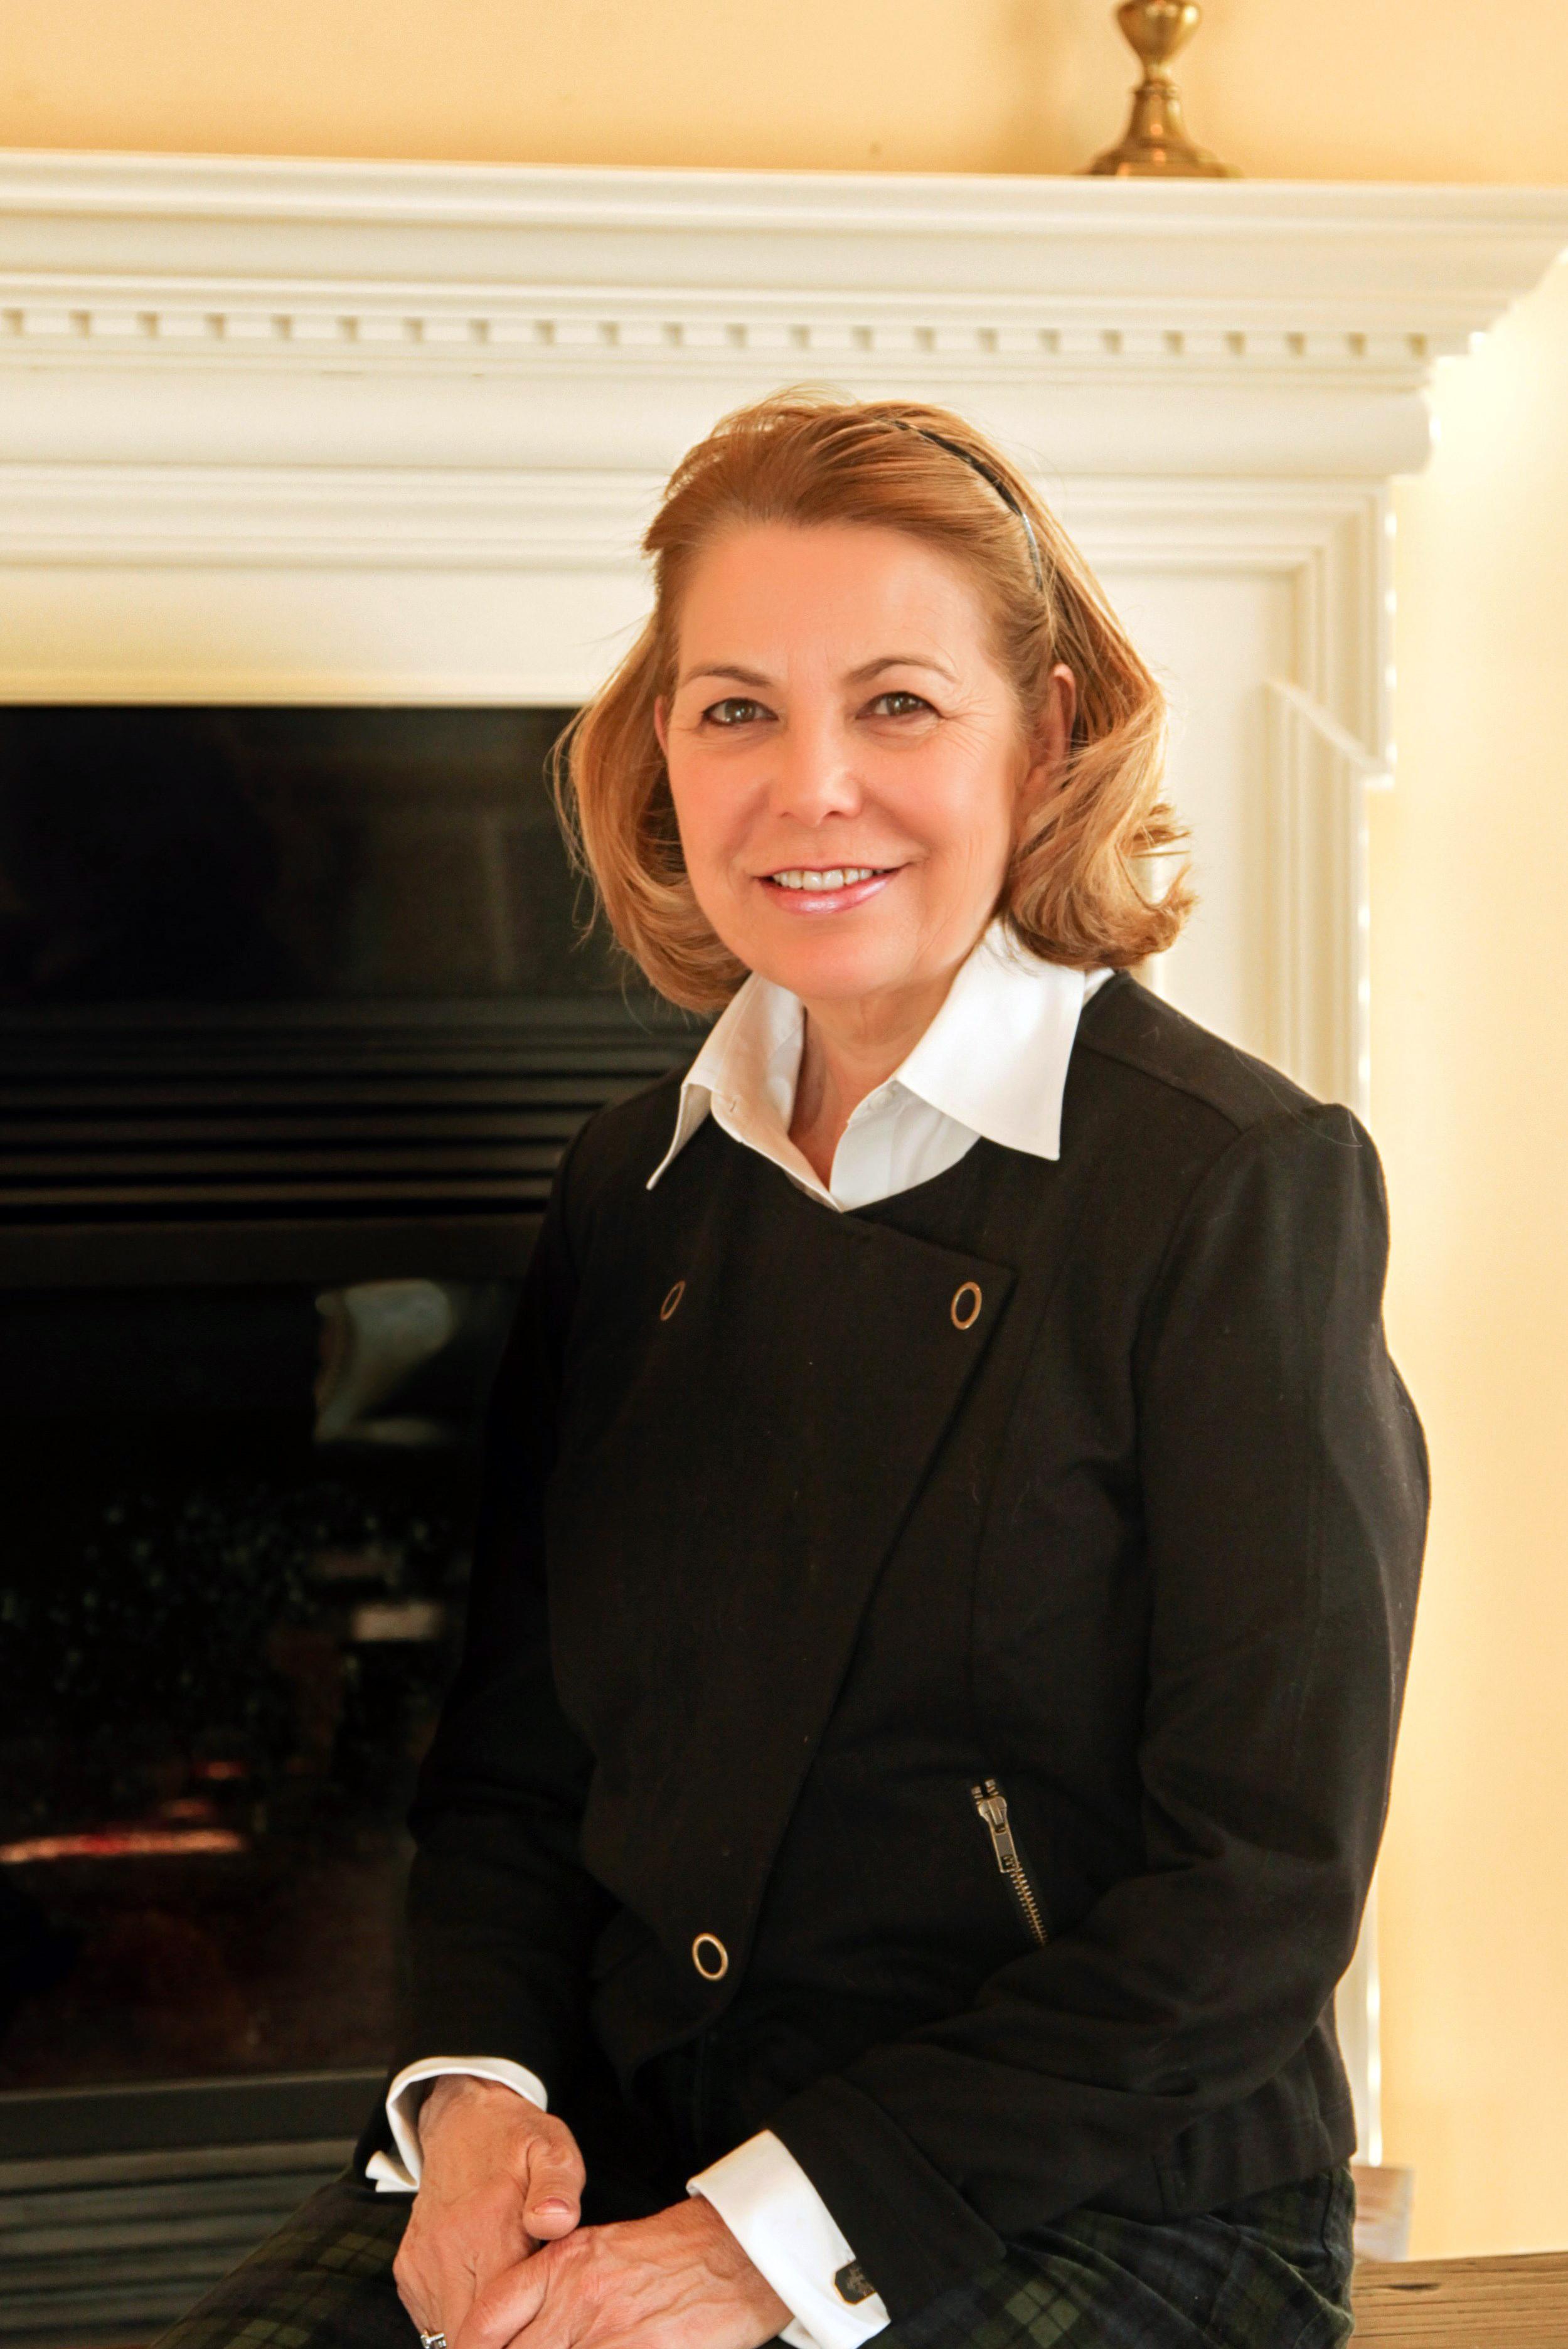 Carol O'Connor